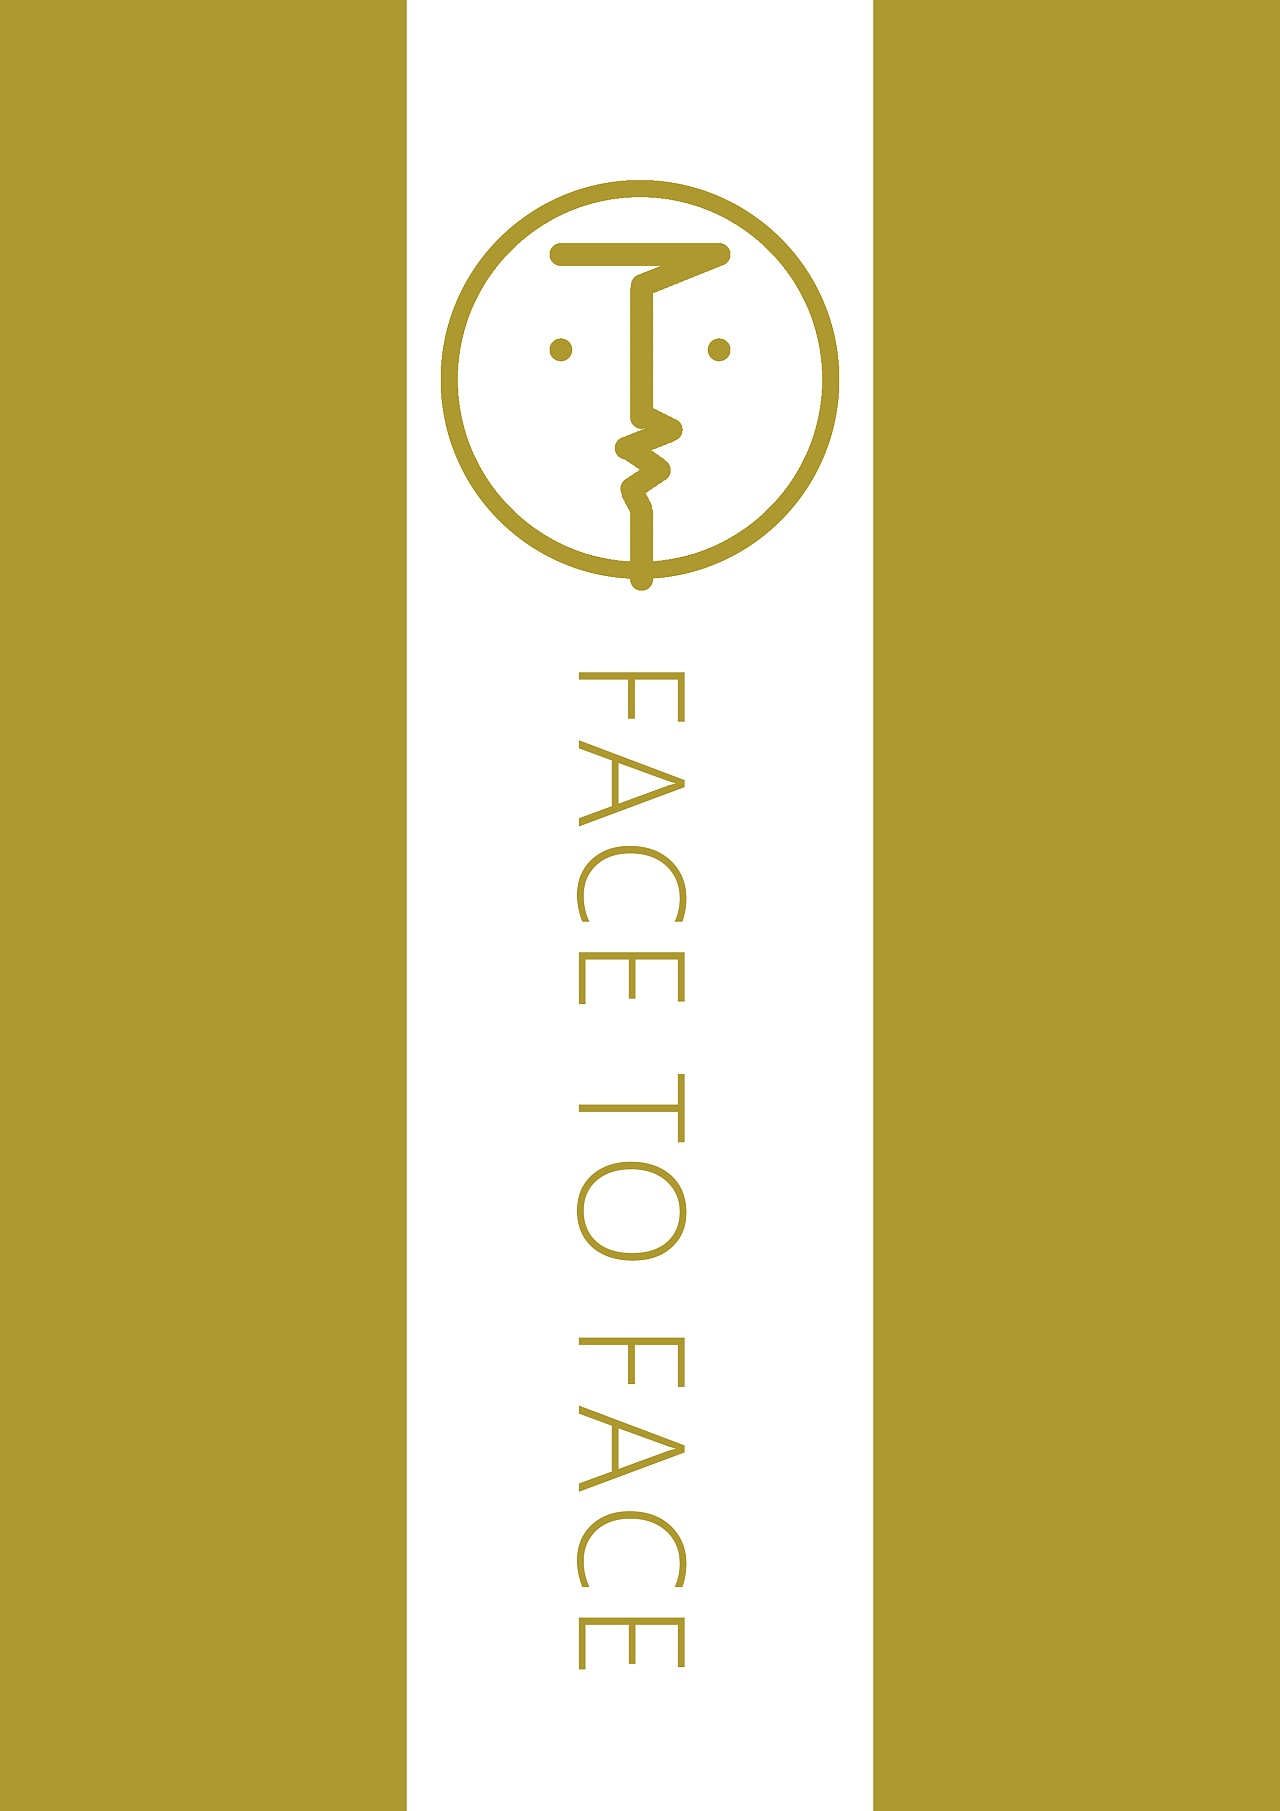 logo为双关图形,左右两边看上去像是两个人脸在面对面地展开交流互